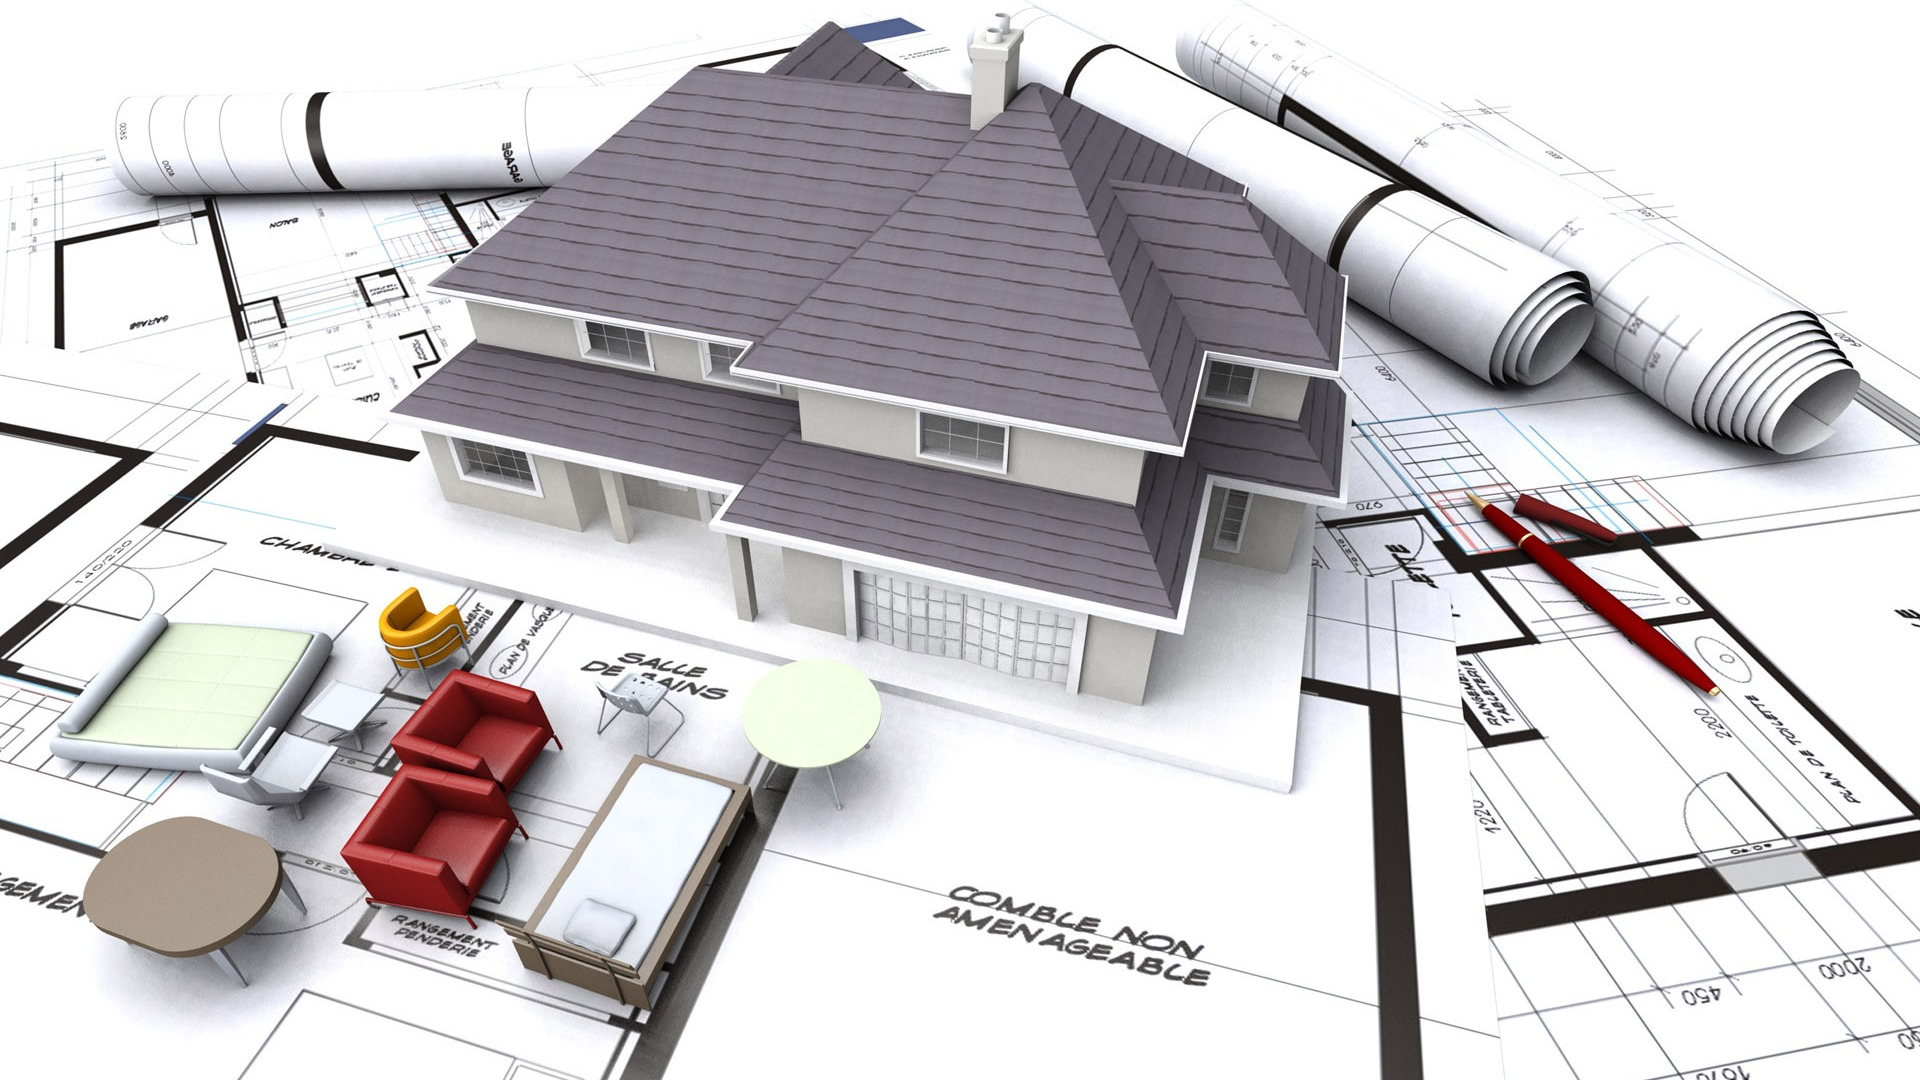 Best Kitchen Gallery: Architectural Architectural U Weup Co of Architectural Design  on rachelxblog.com